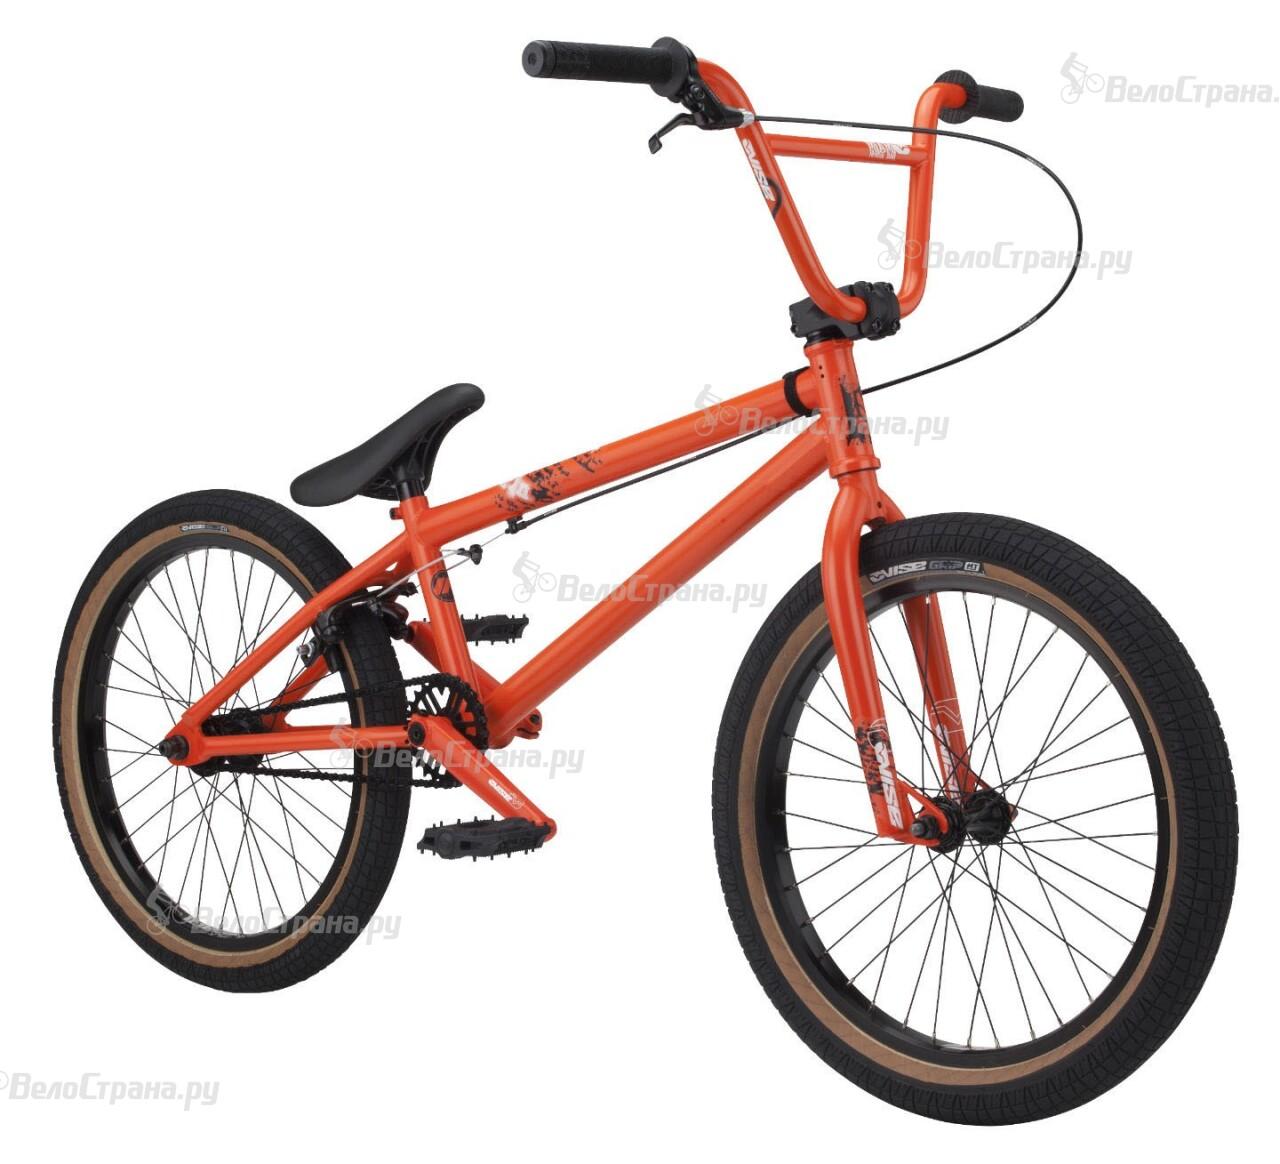 Велосипед Forward TERRA 918 disk (2013) велосипед forward terra 918 disk 2013